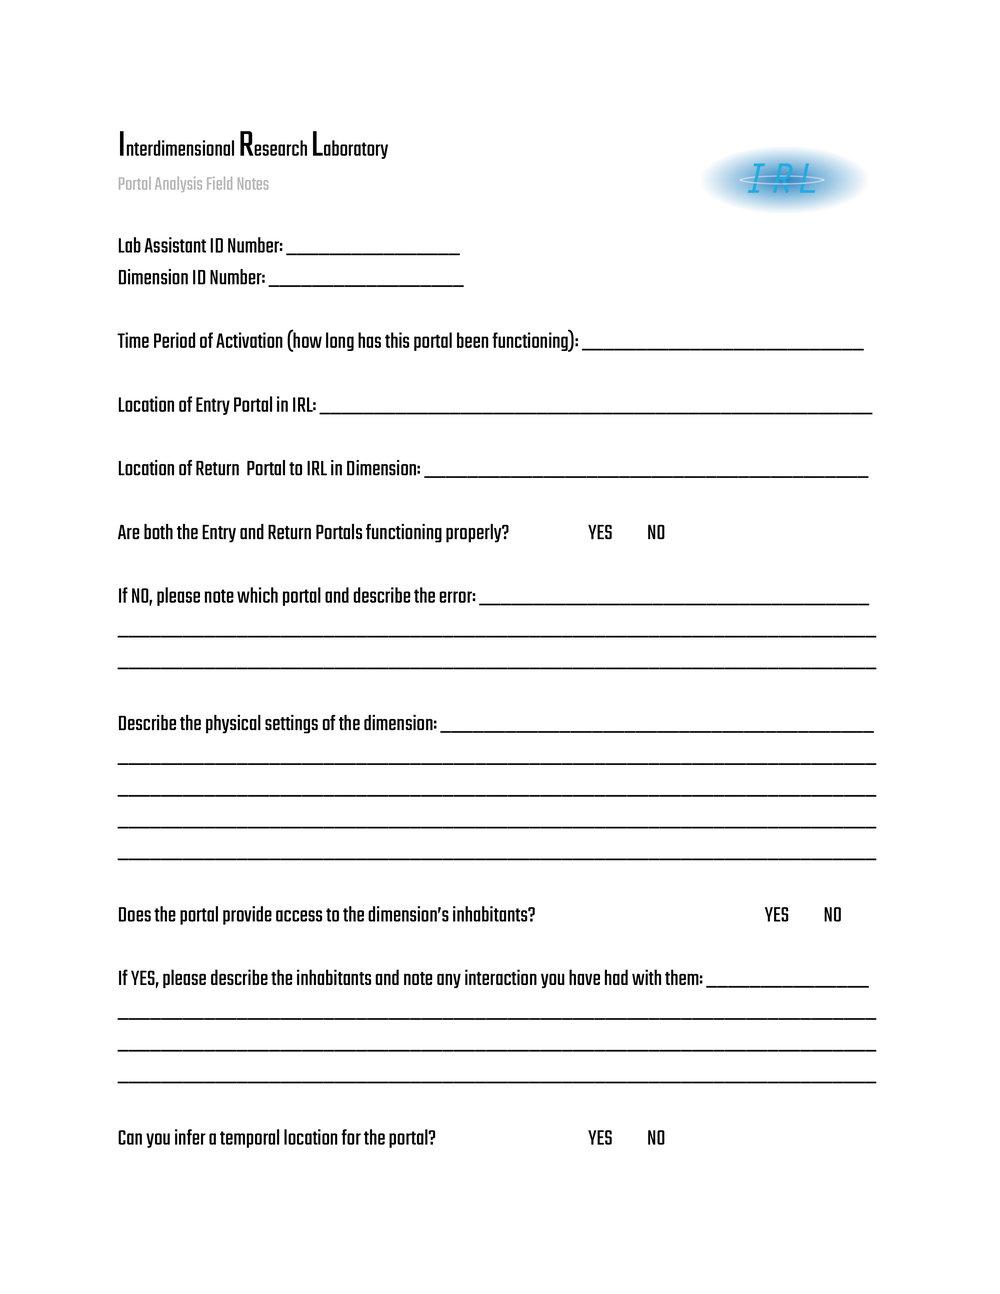 IRL Contract 4.jpg